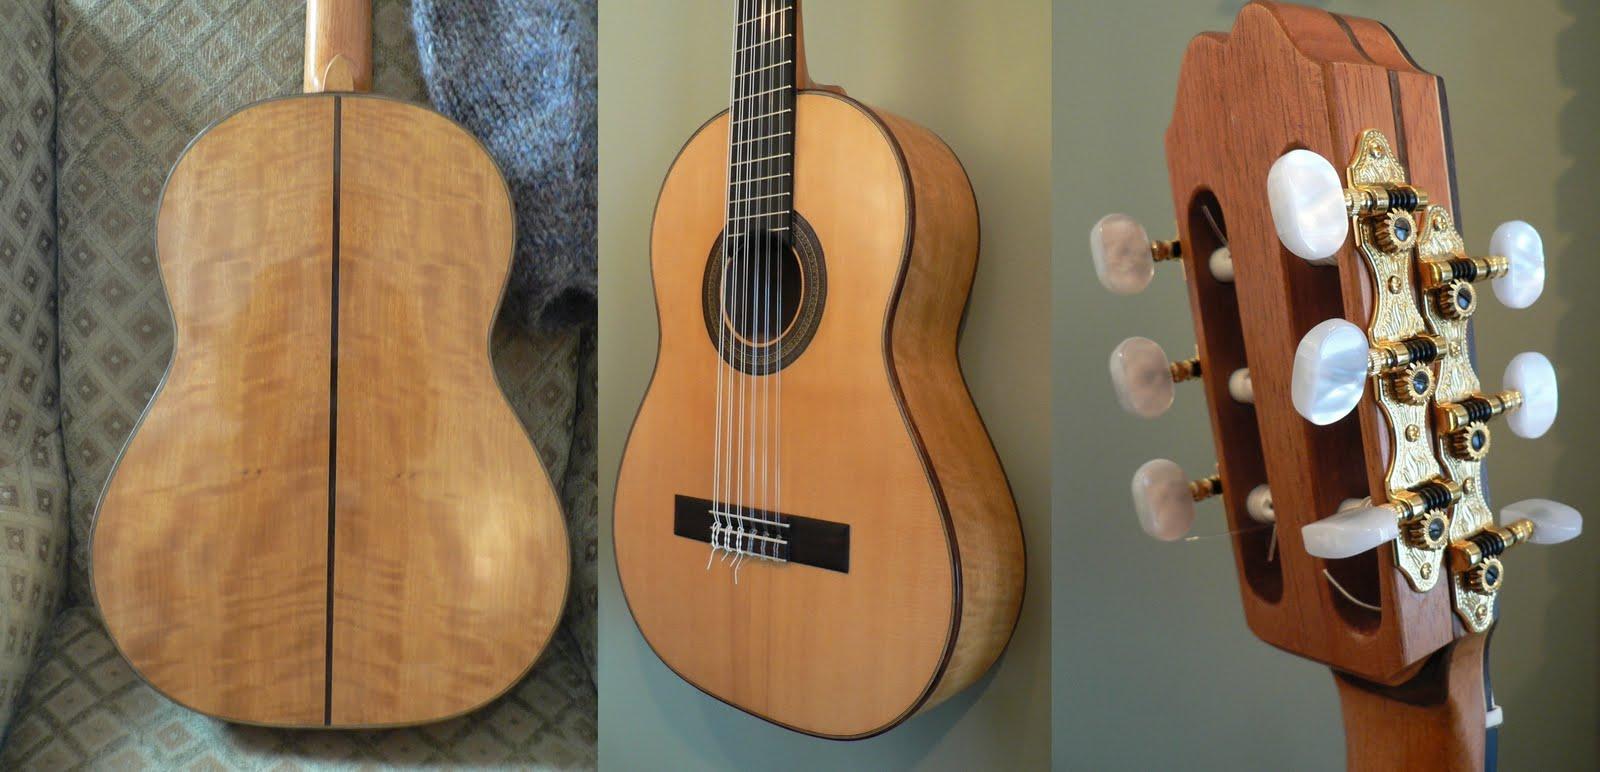 bill rayner luthier classical guitar ukulele classical guitars. Black Bedroom Furniture Sets. Home Design Ideas